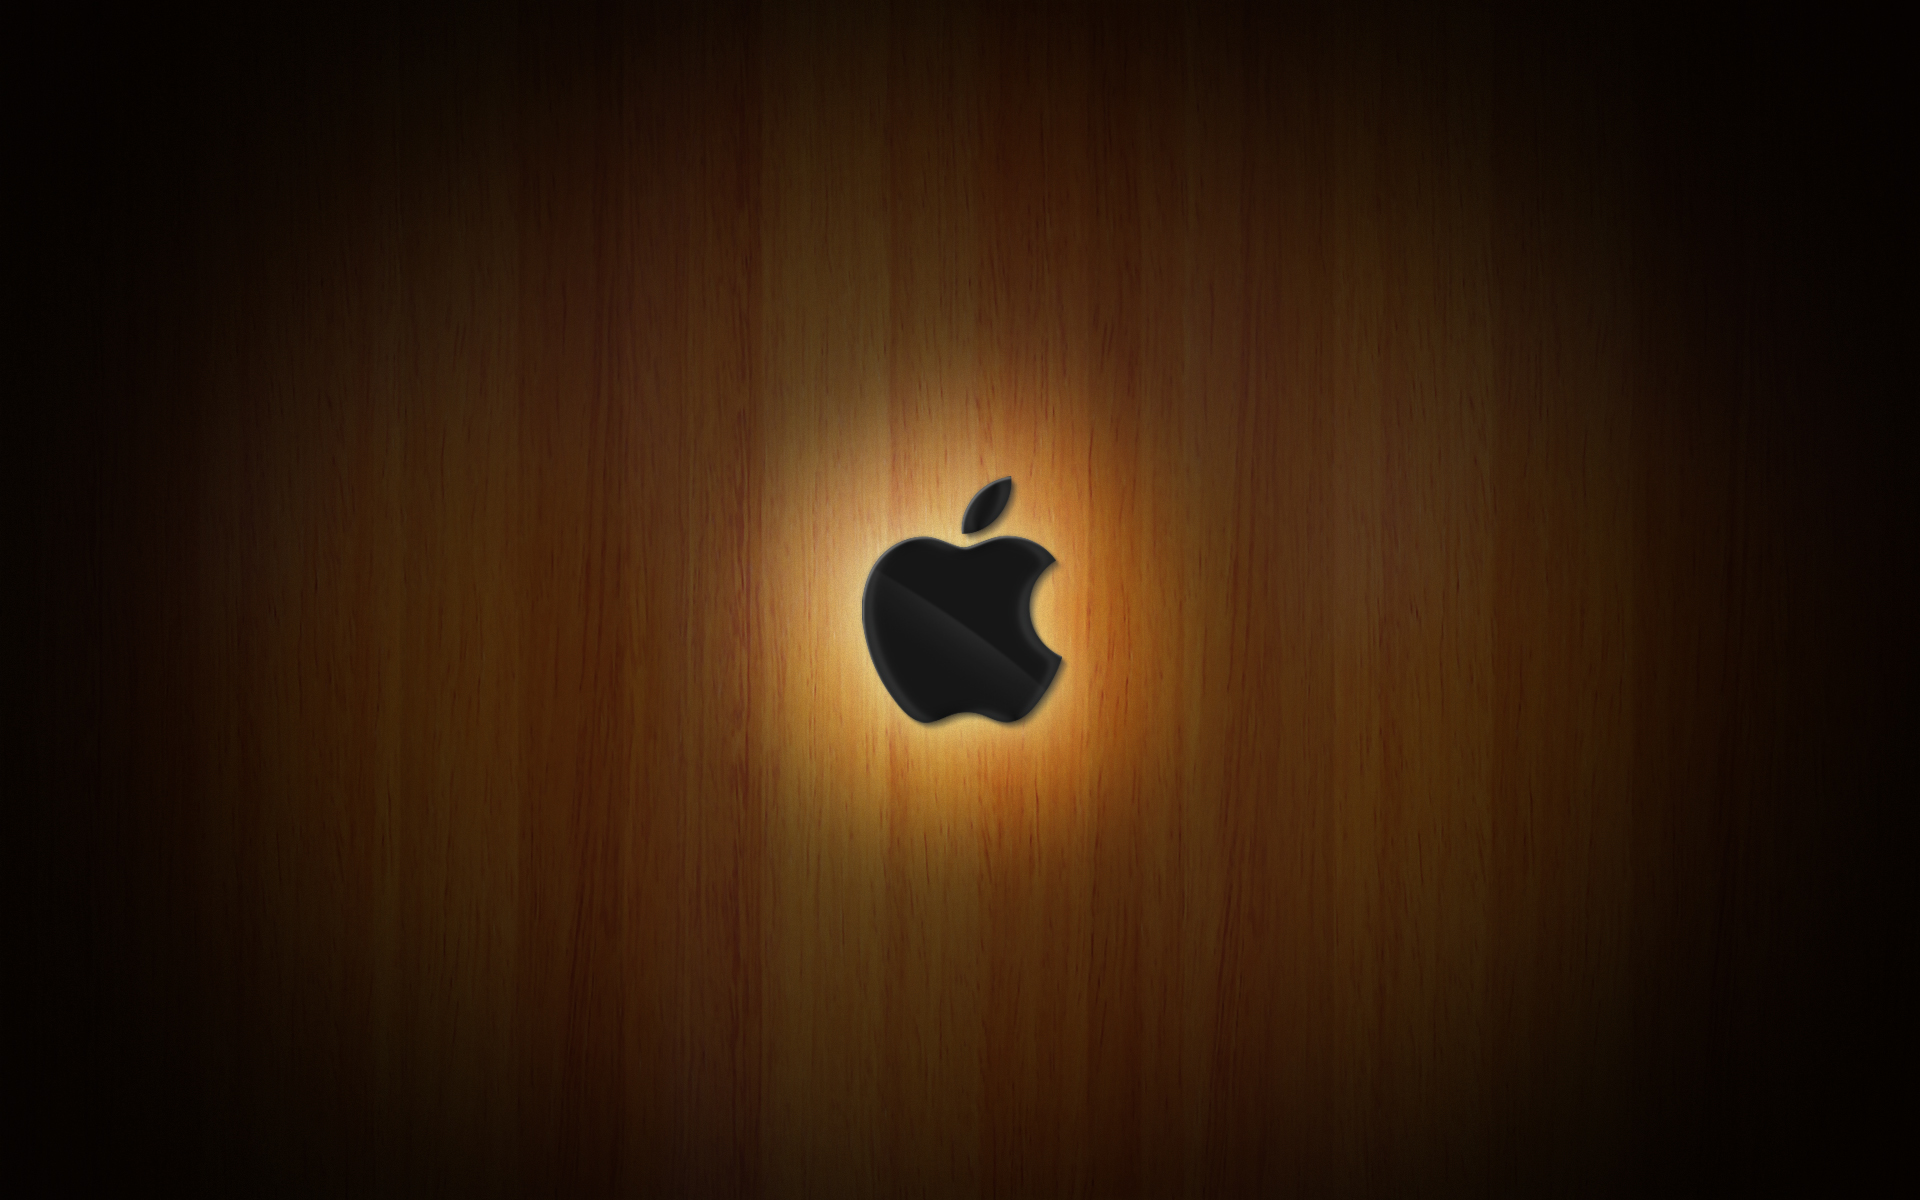 Best Hd Apple Wallpapers Apple Wallpapers Desktop Backgrounds 1680x1050